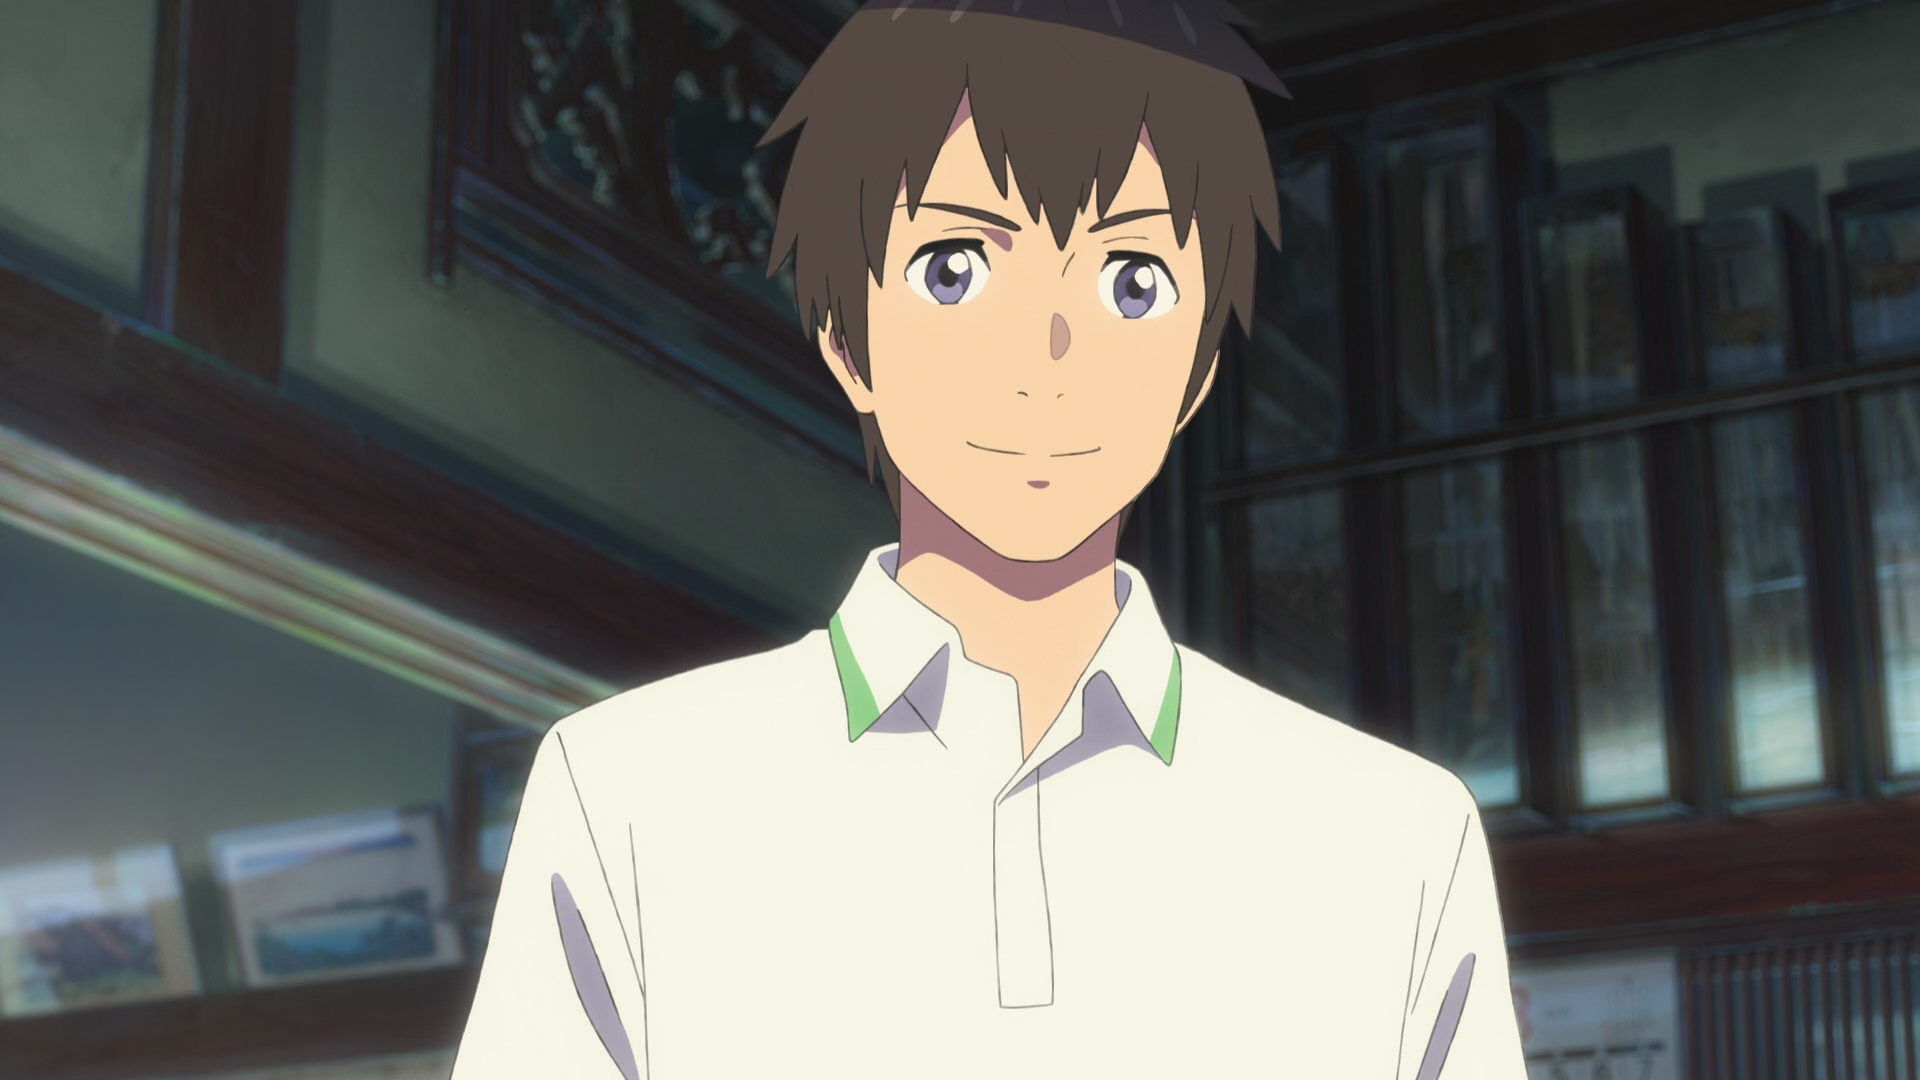 Taki Tachibana Makoto Shinkai Wiki Fandom